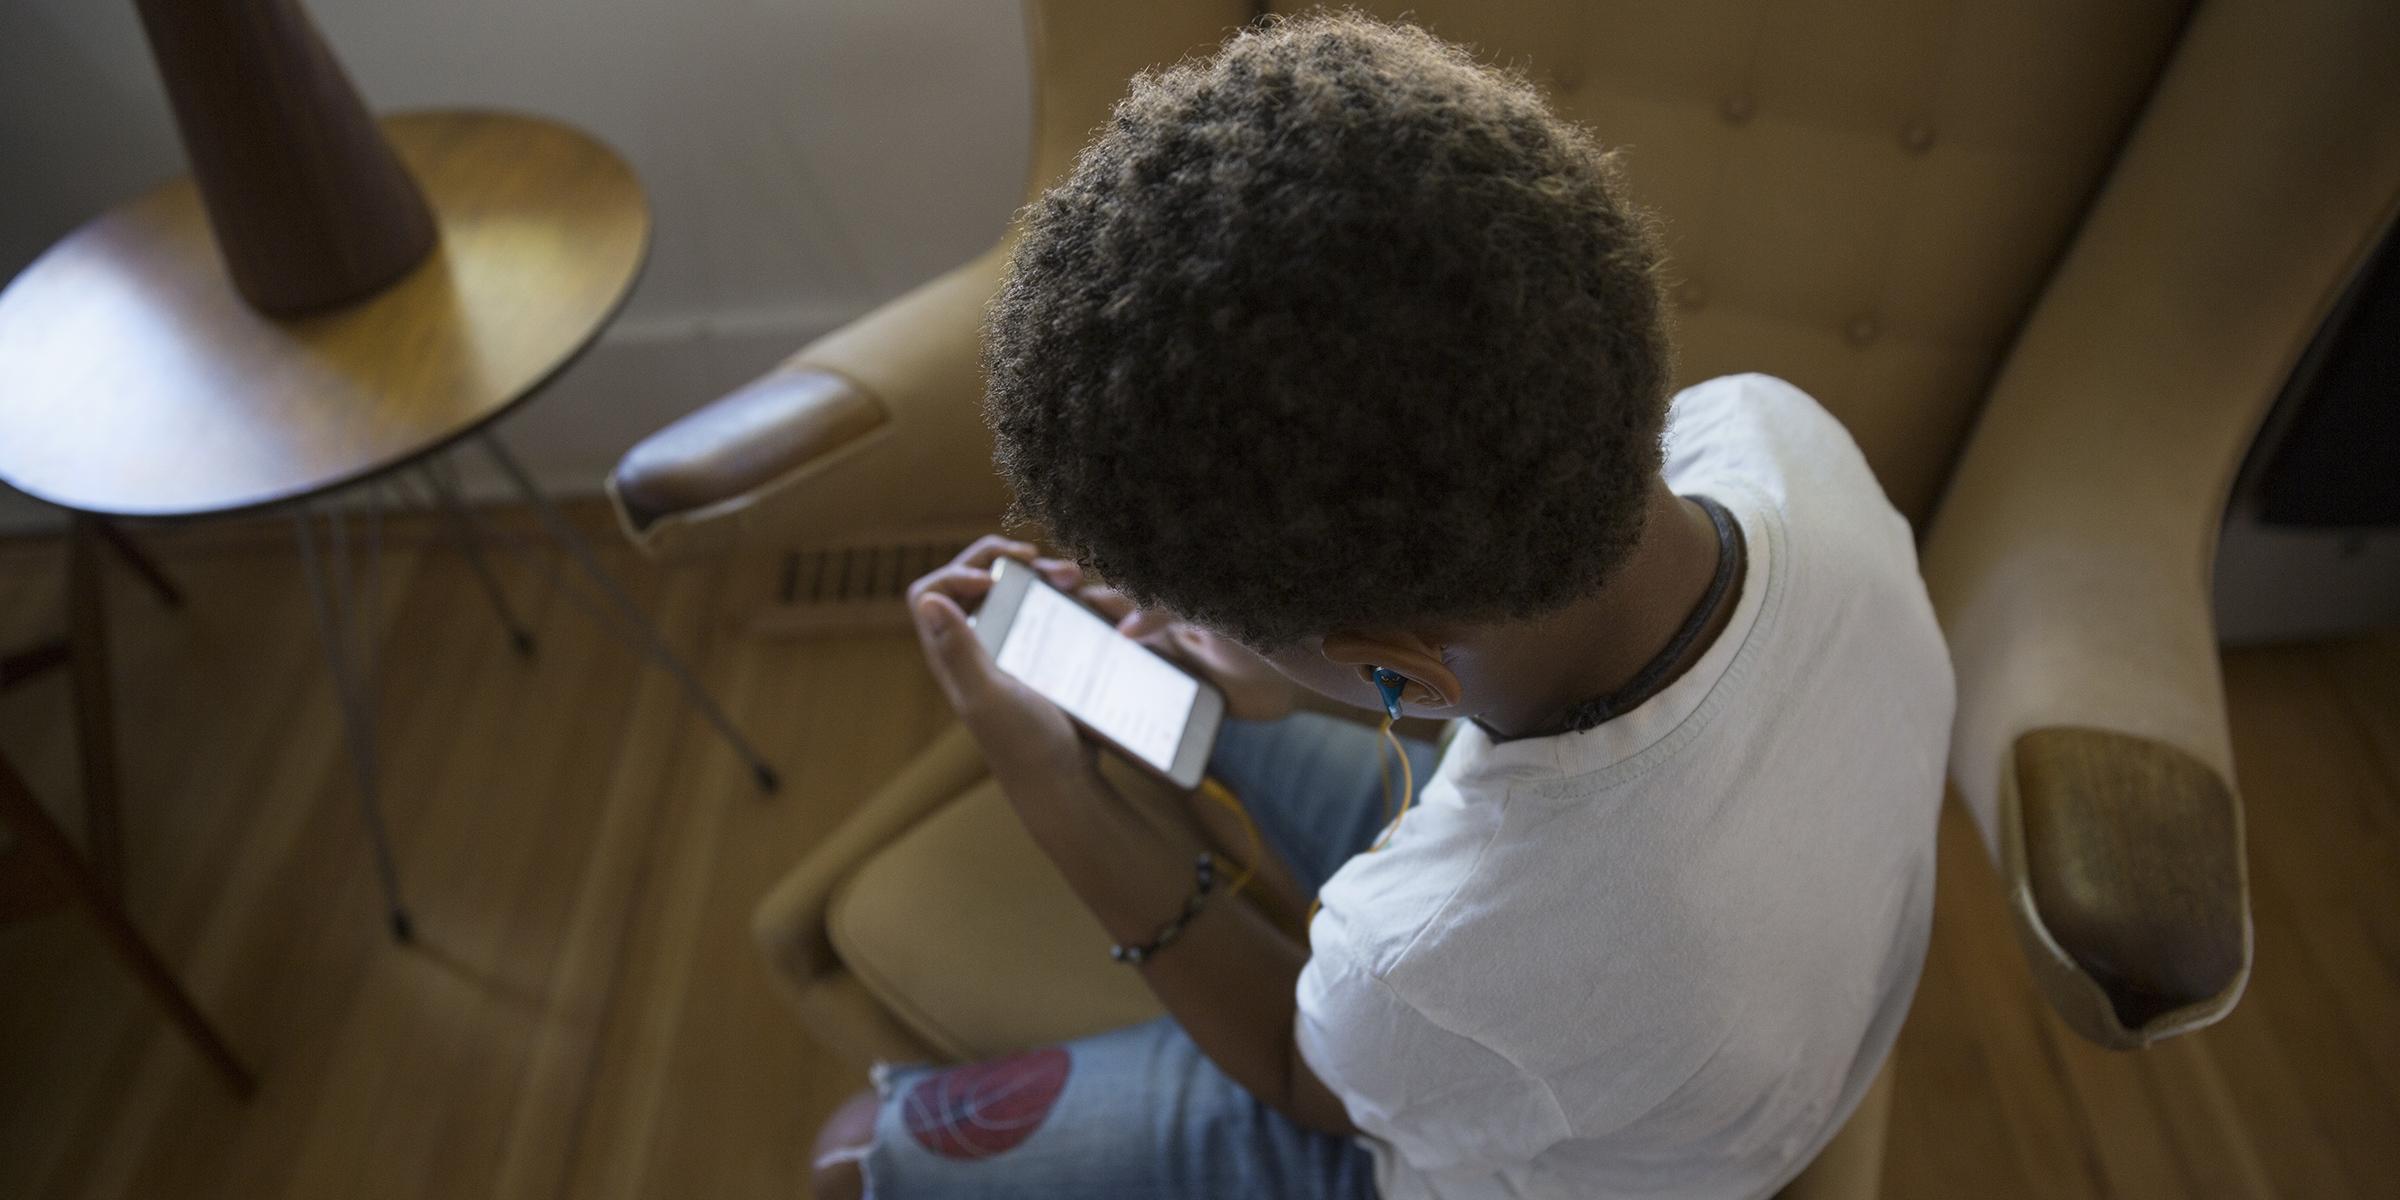 Cyberbullying: Mom credits Bark app for saving teen's life